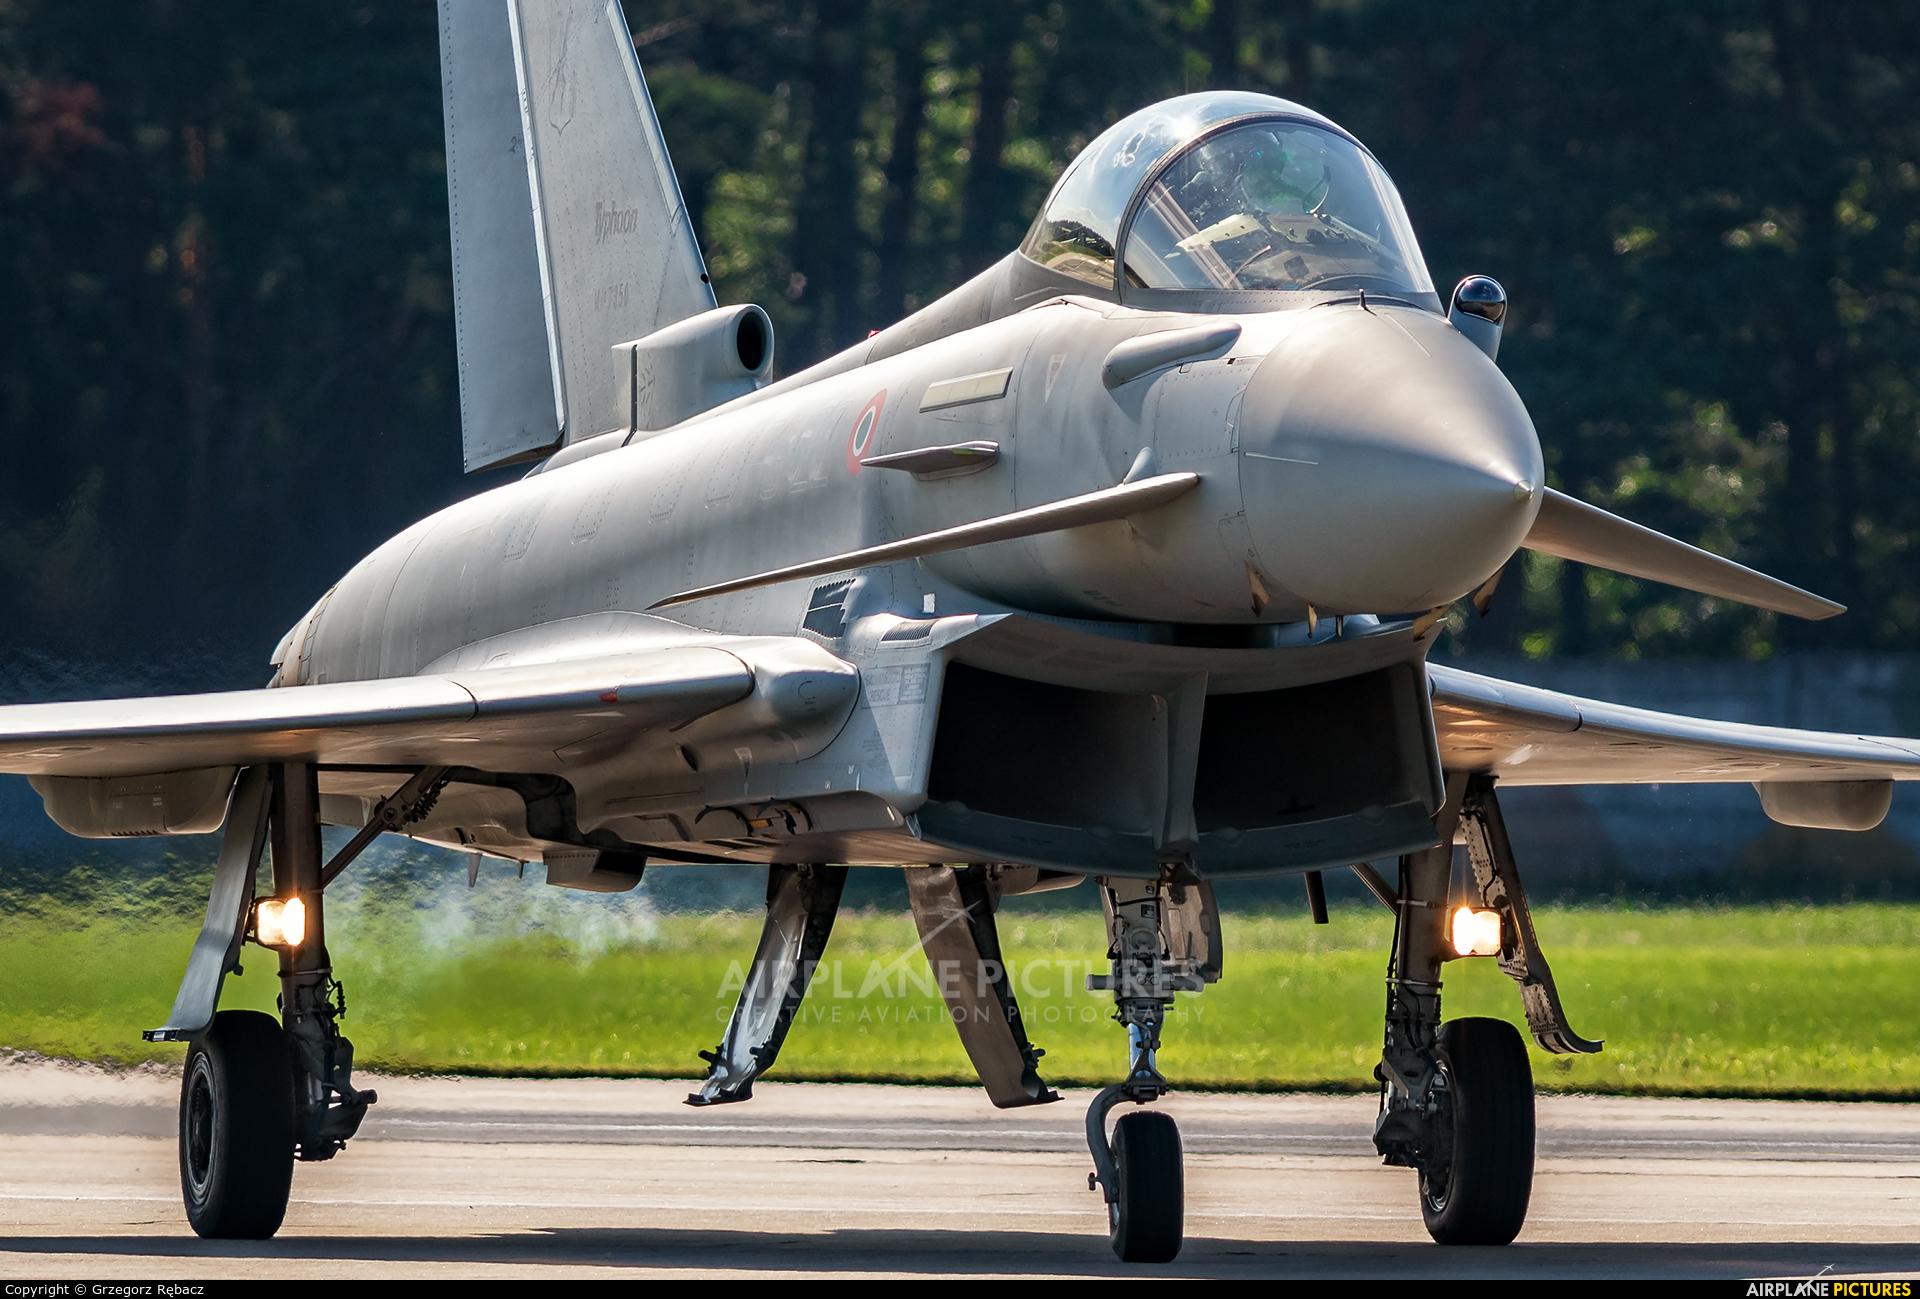 Italy - Air Force MM7350 aircraft at Malacky - Kuchyna